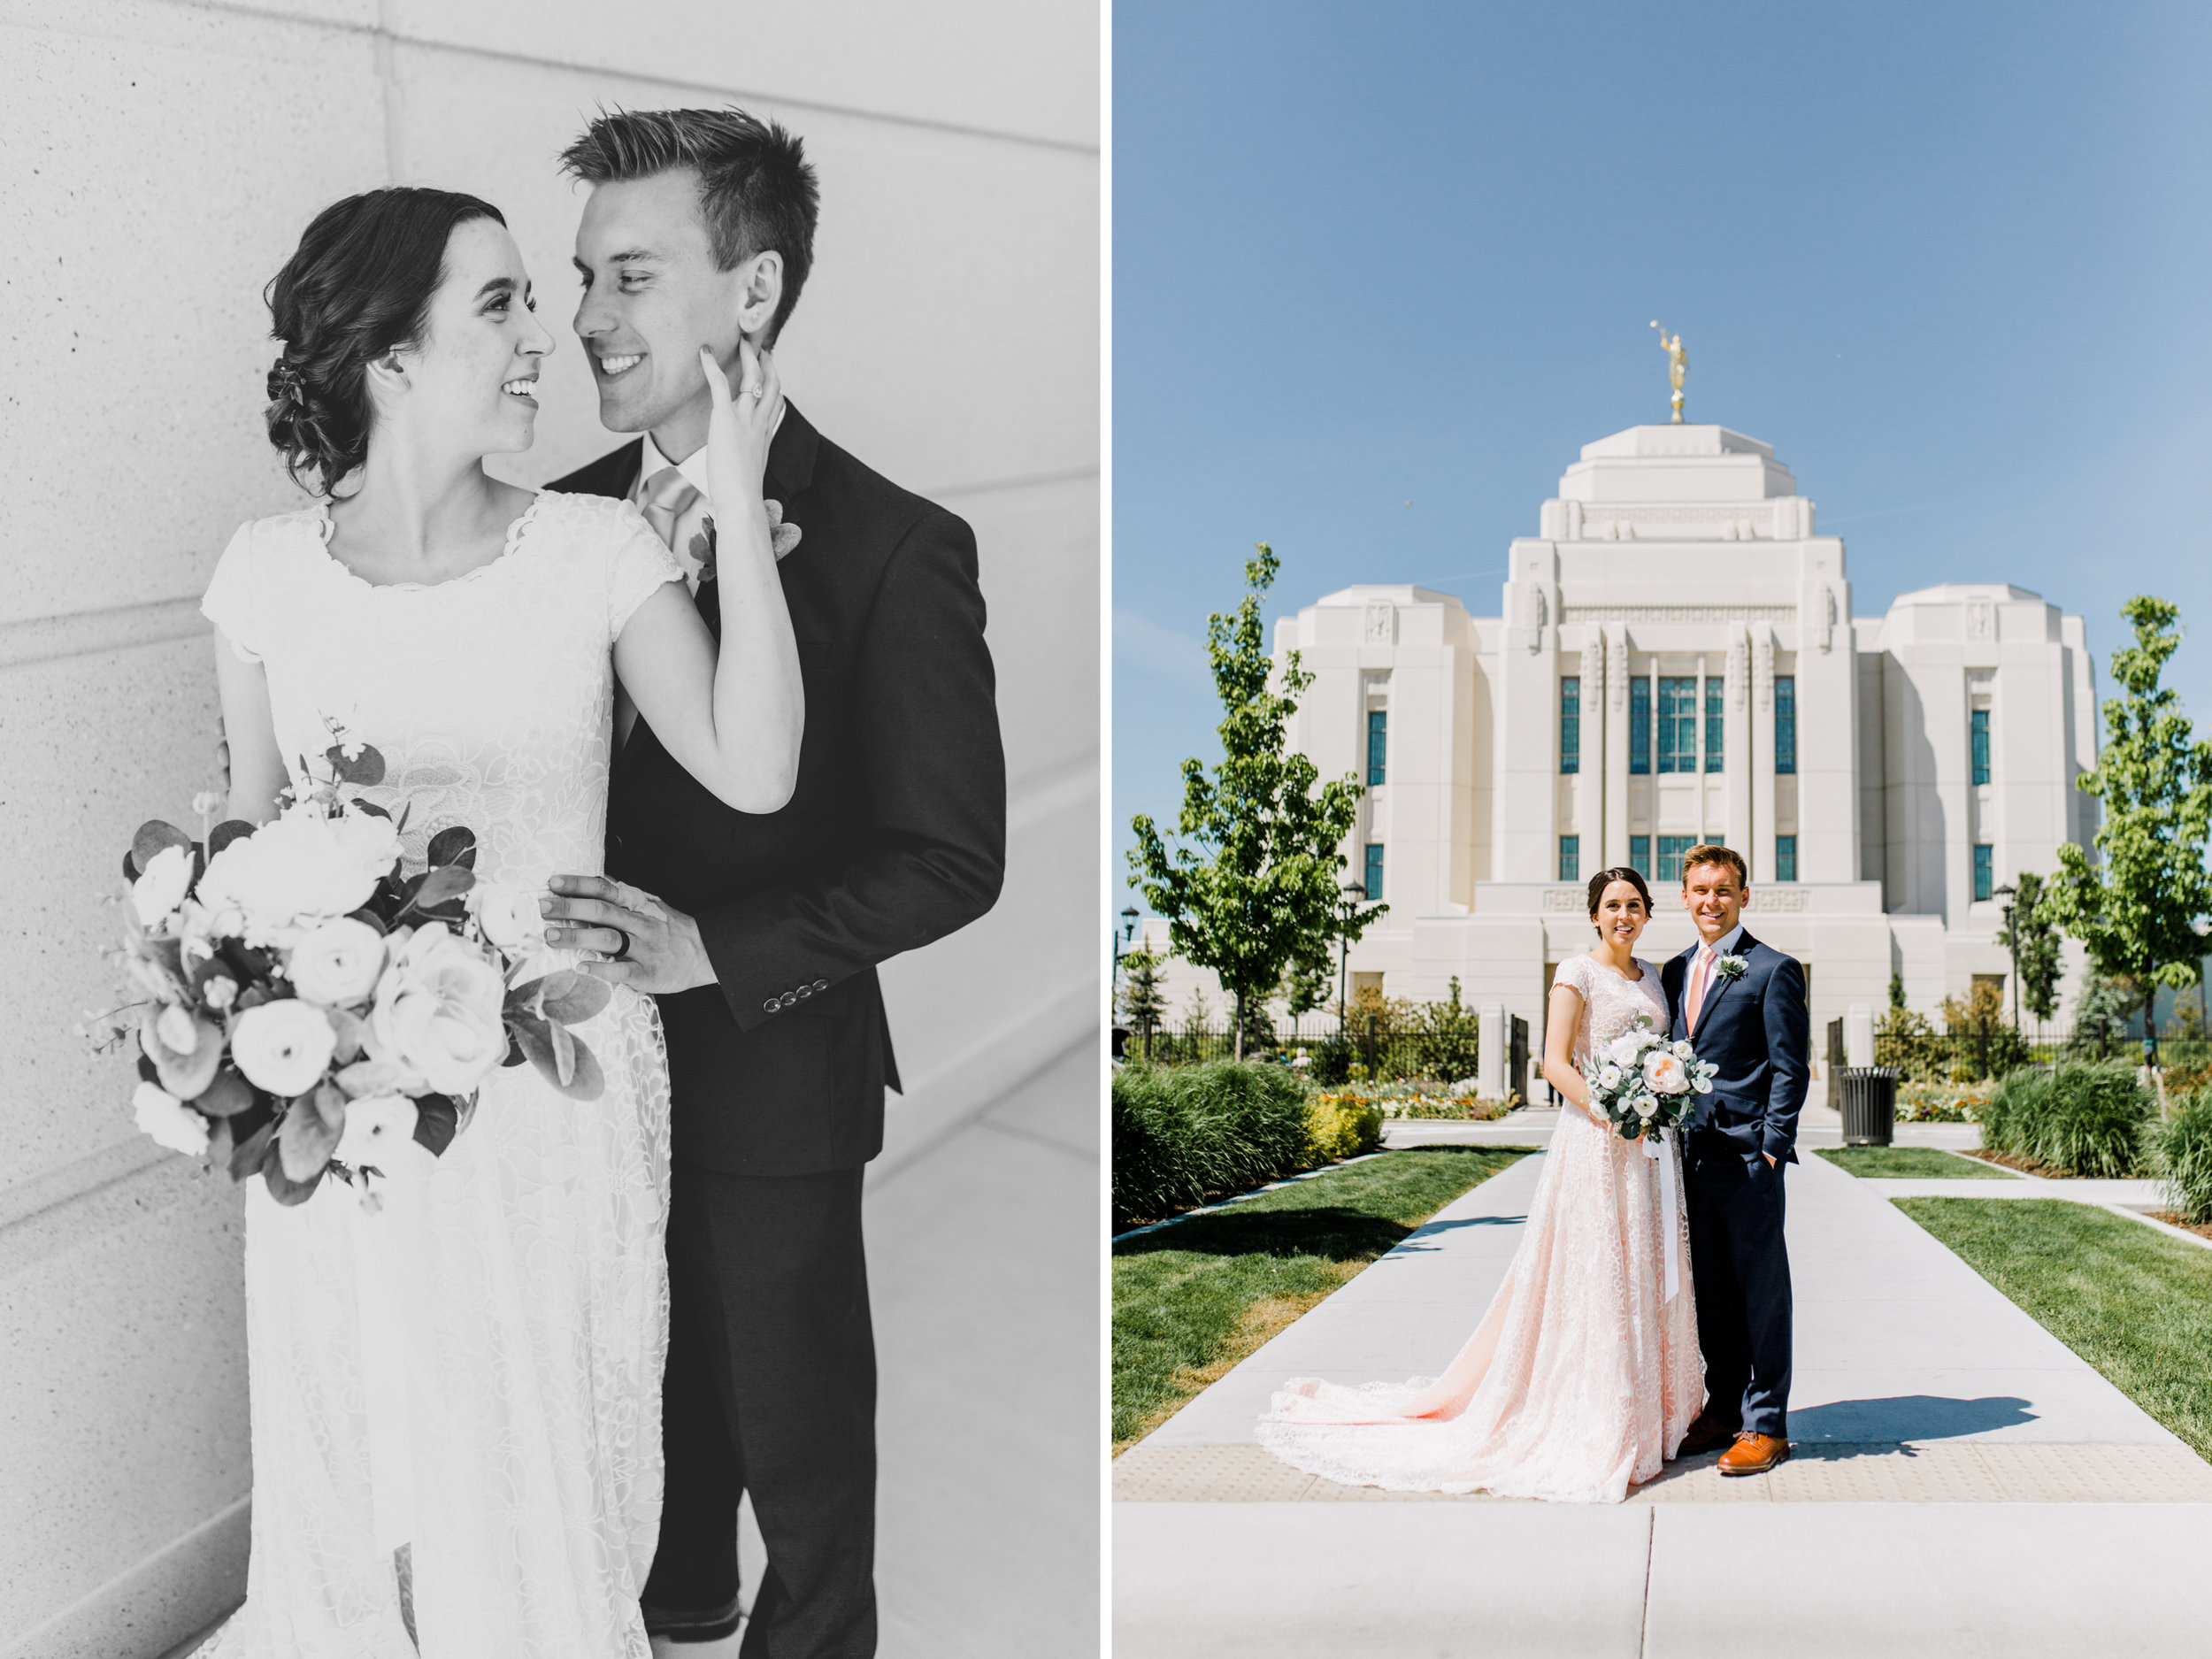 lds-meridian-temple-wedding-photographer-anna-christine-photography-rexburg9.jpg